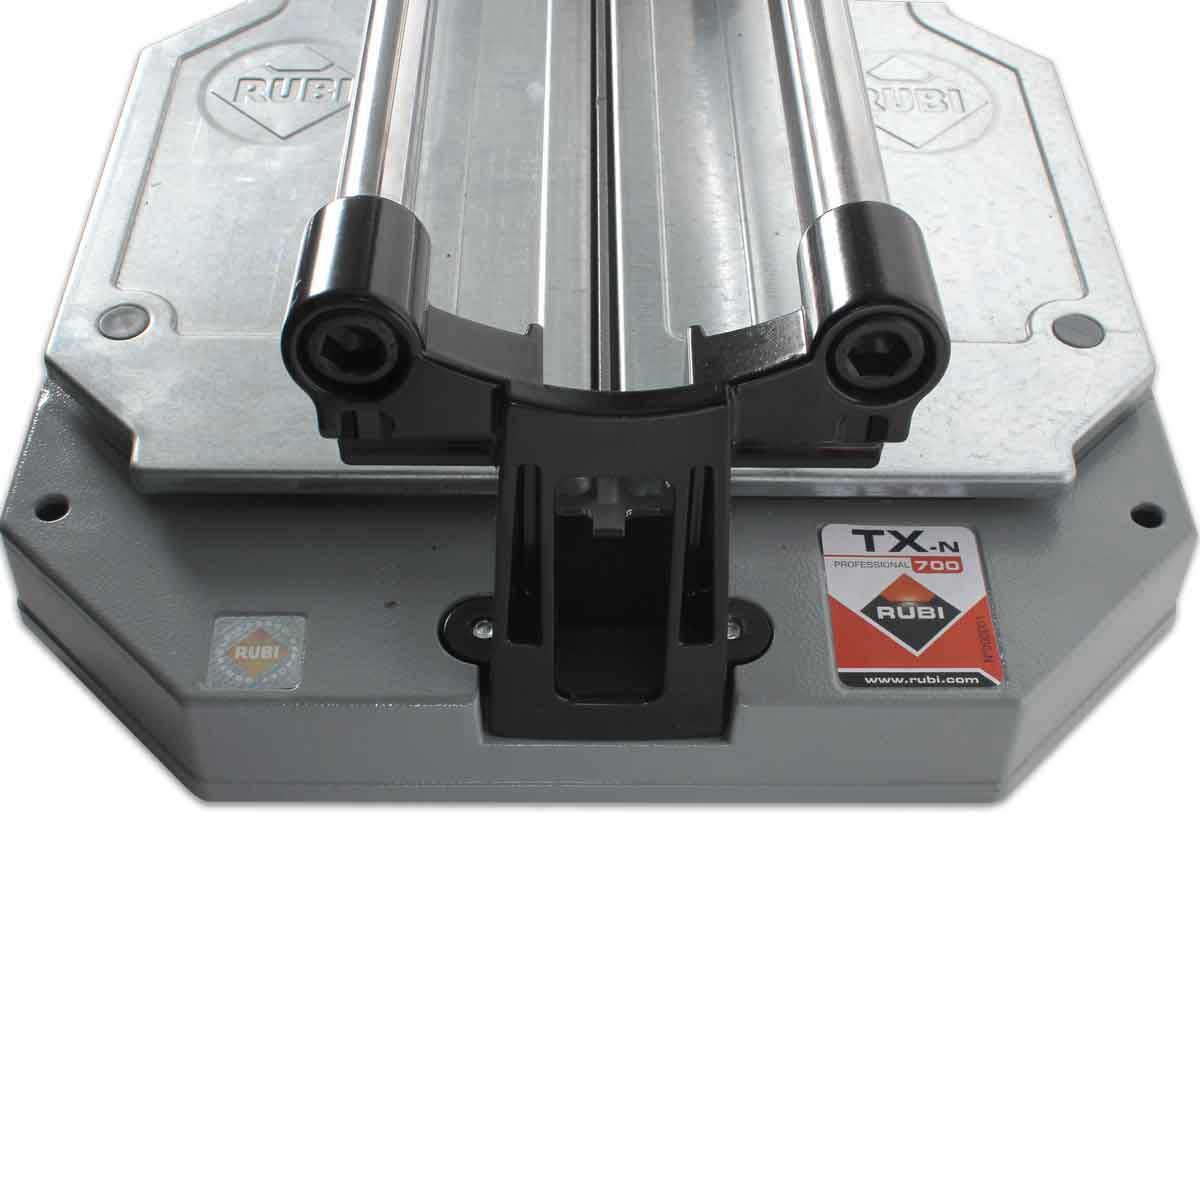 rubi tx-700-n tile cutter